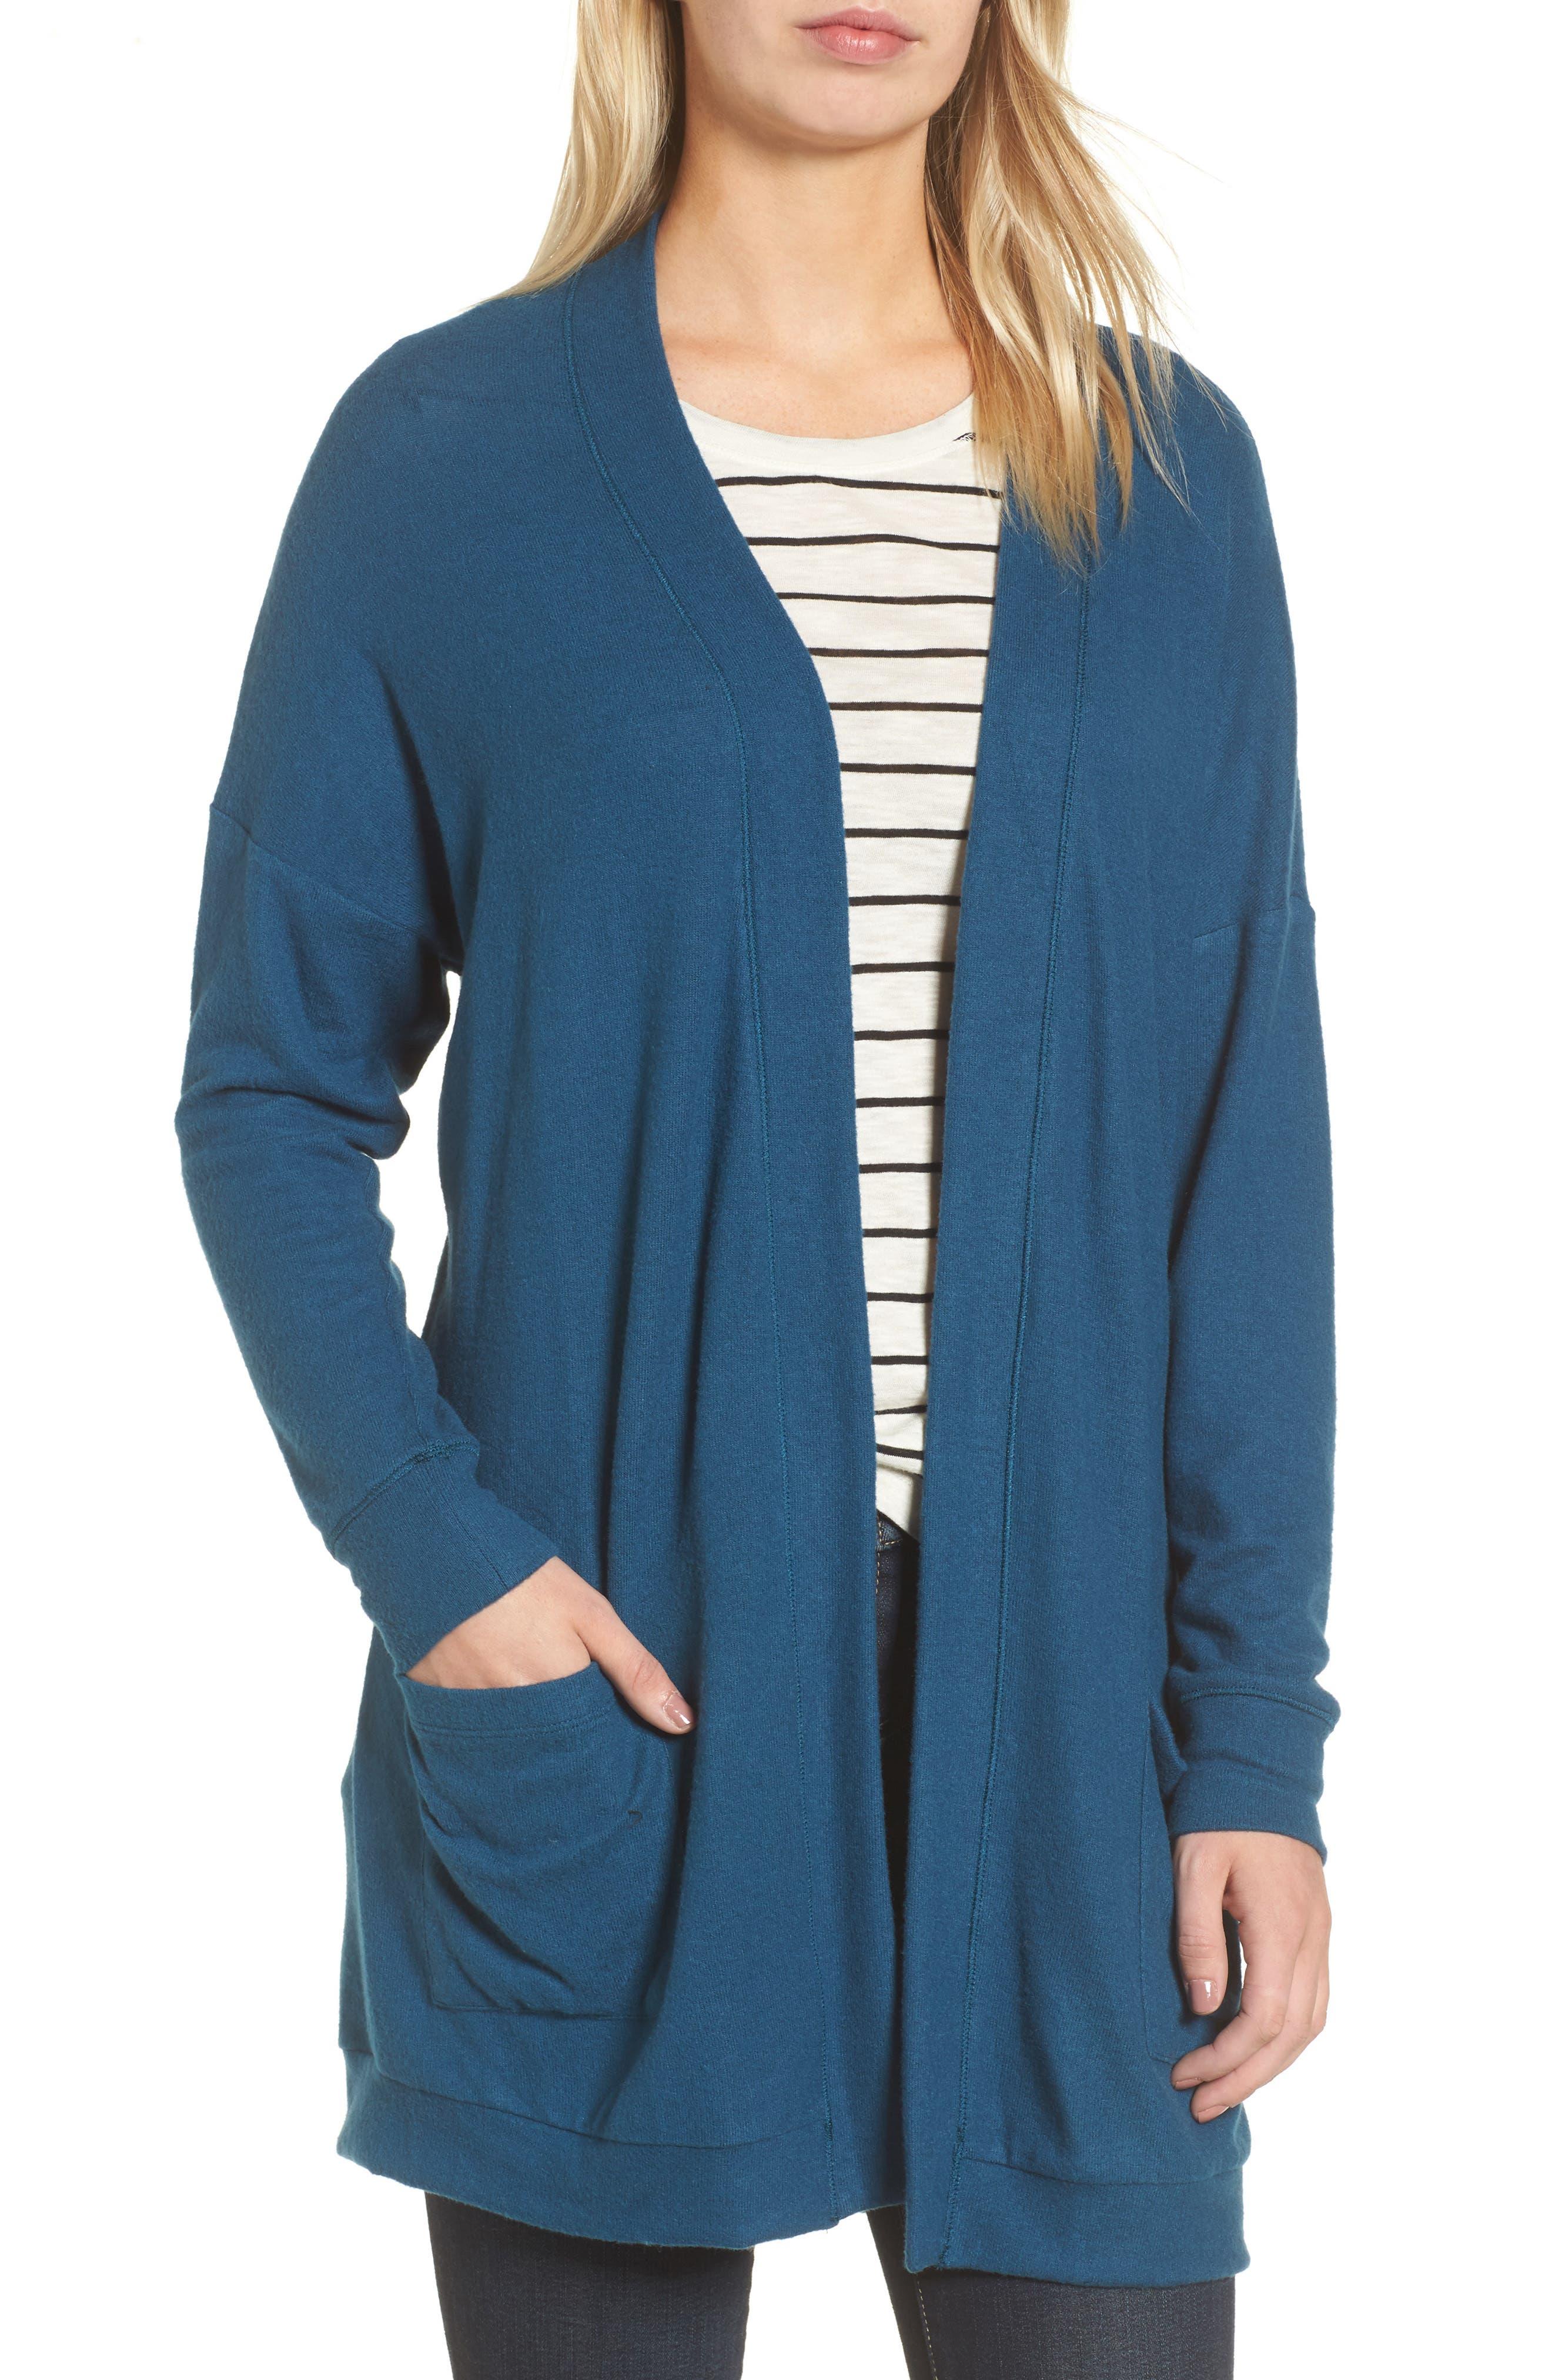 GIBSON Rib Knit Cardigan, Main, color, BLUE CERAMIC